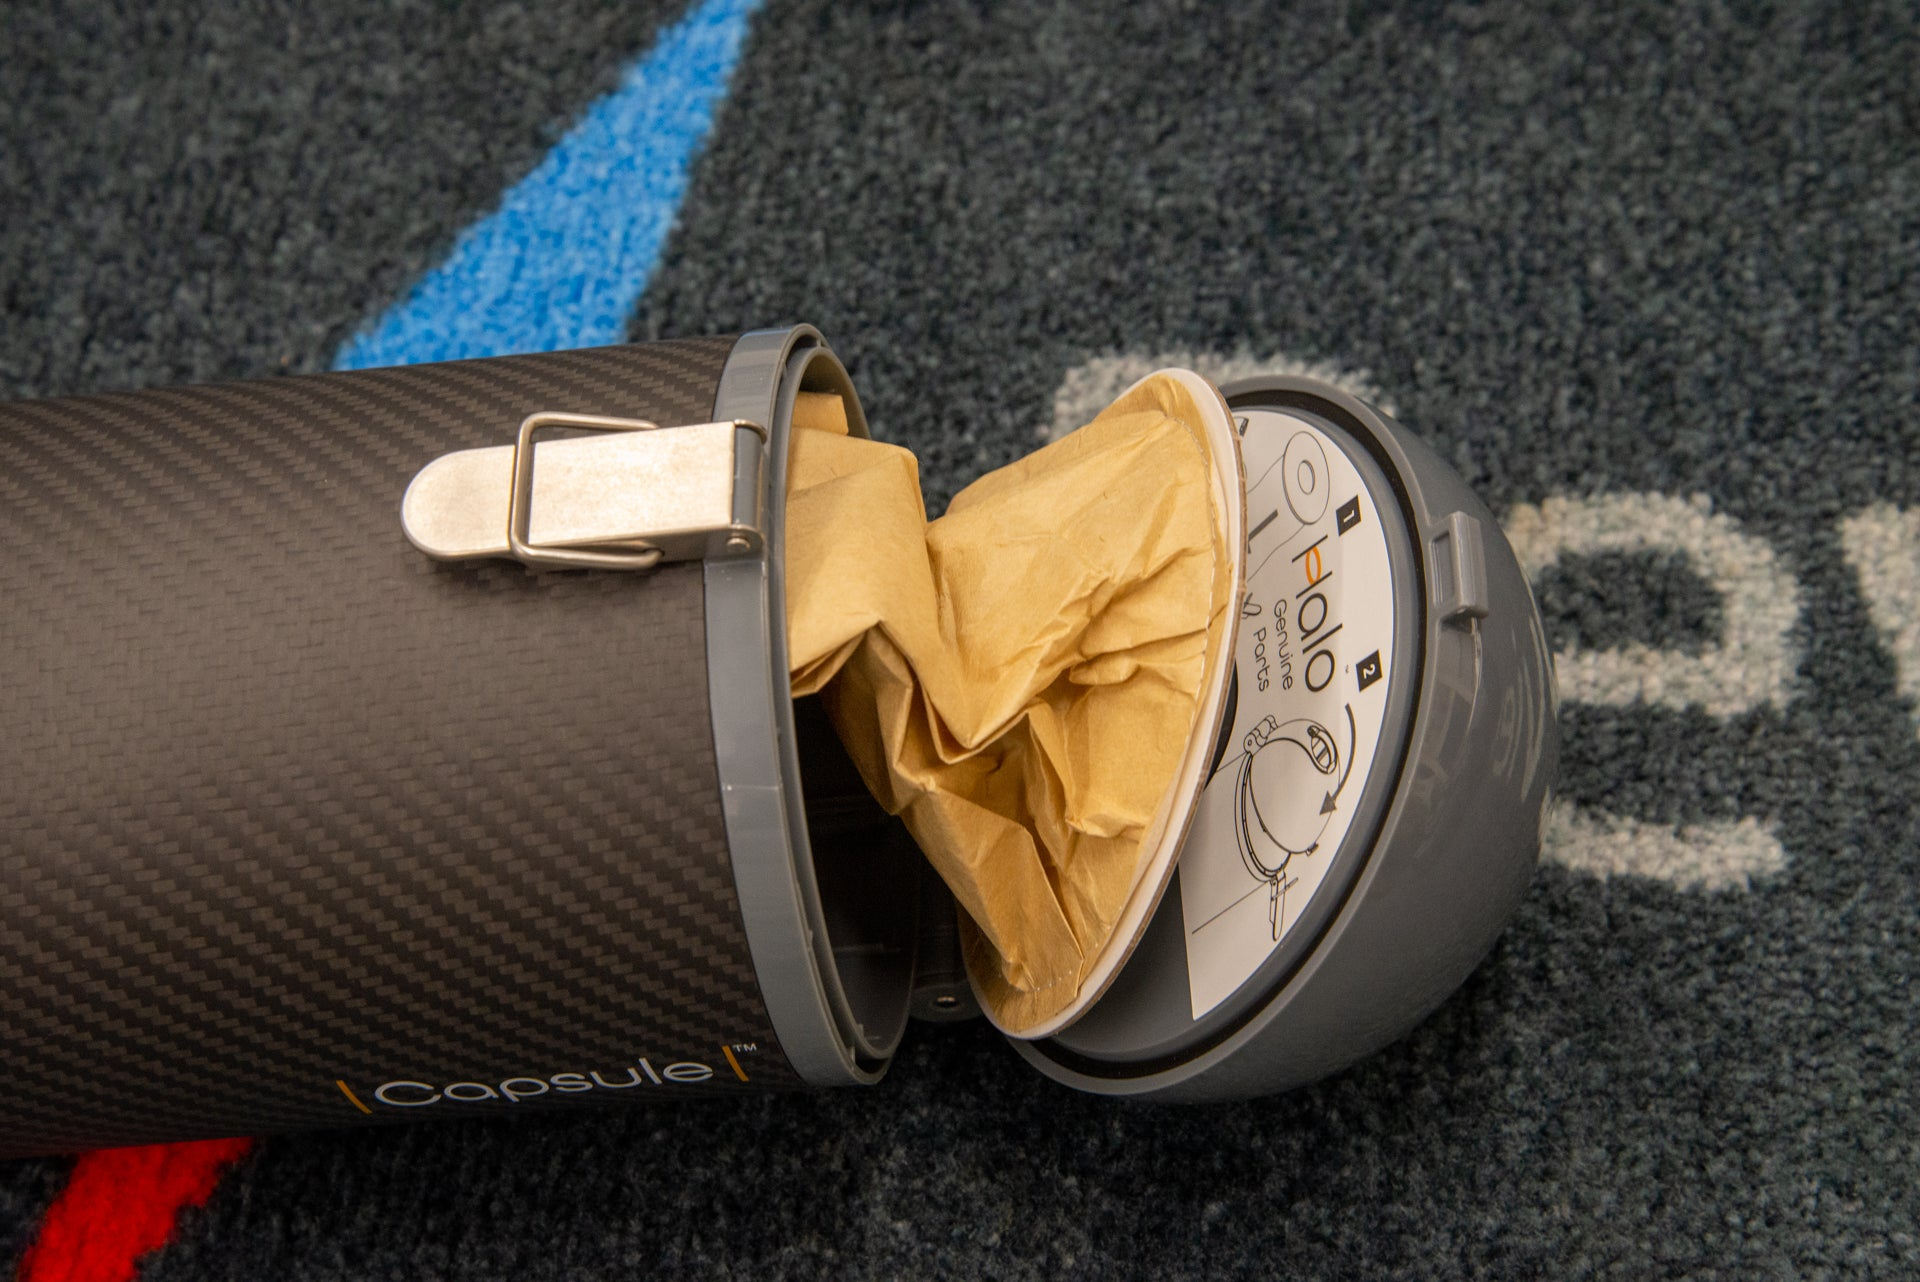 Halo Capsule dust pouch